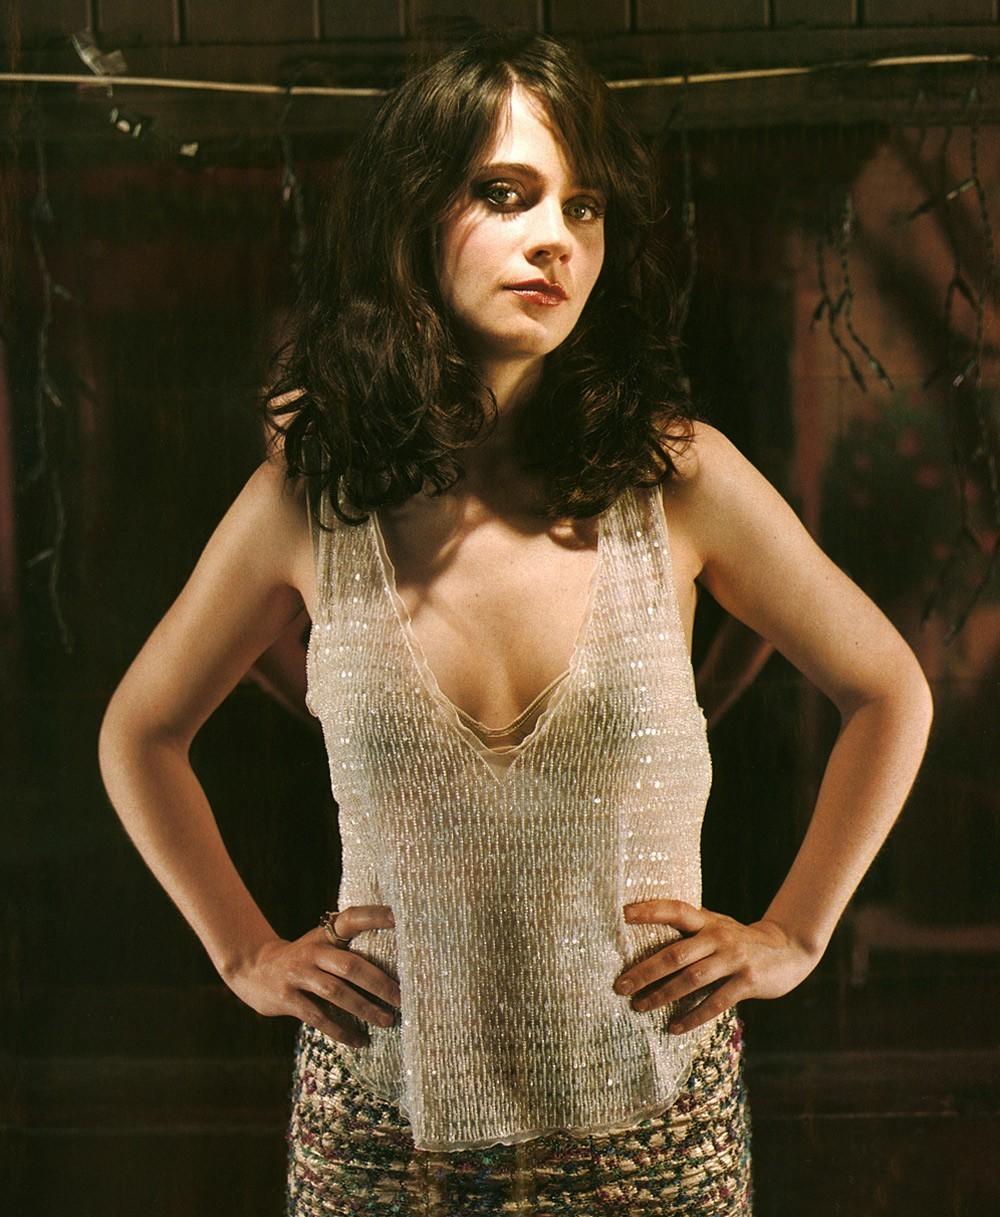 Alexandra daddario nude true detective s01e02 4